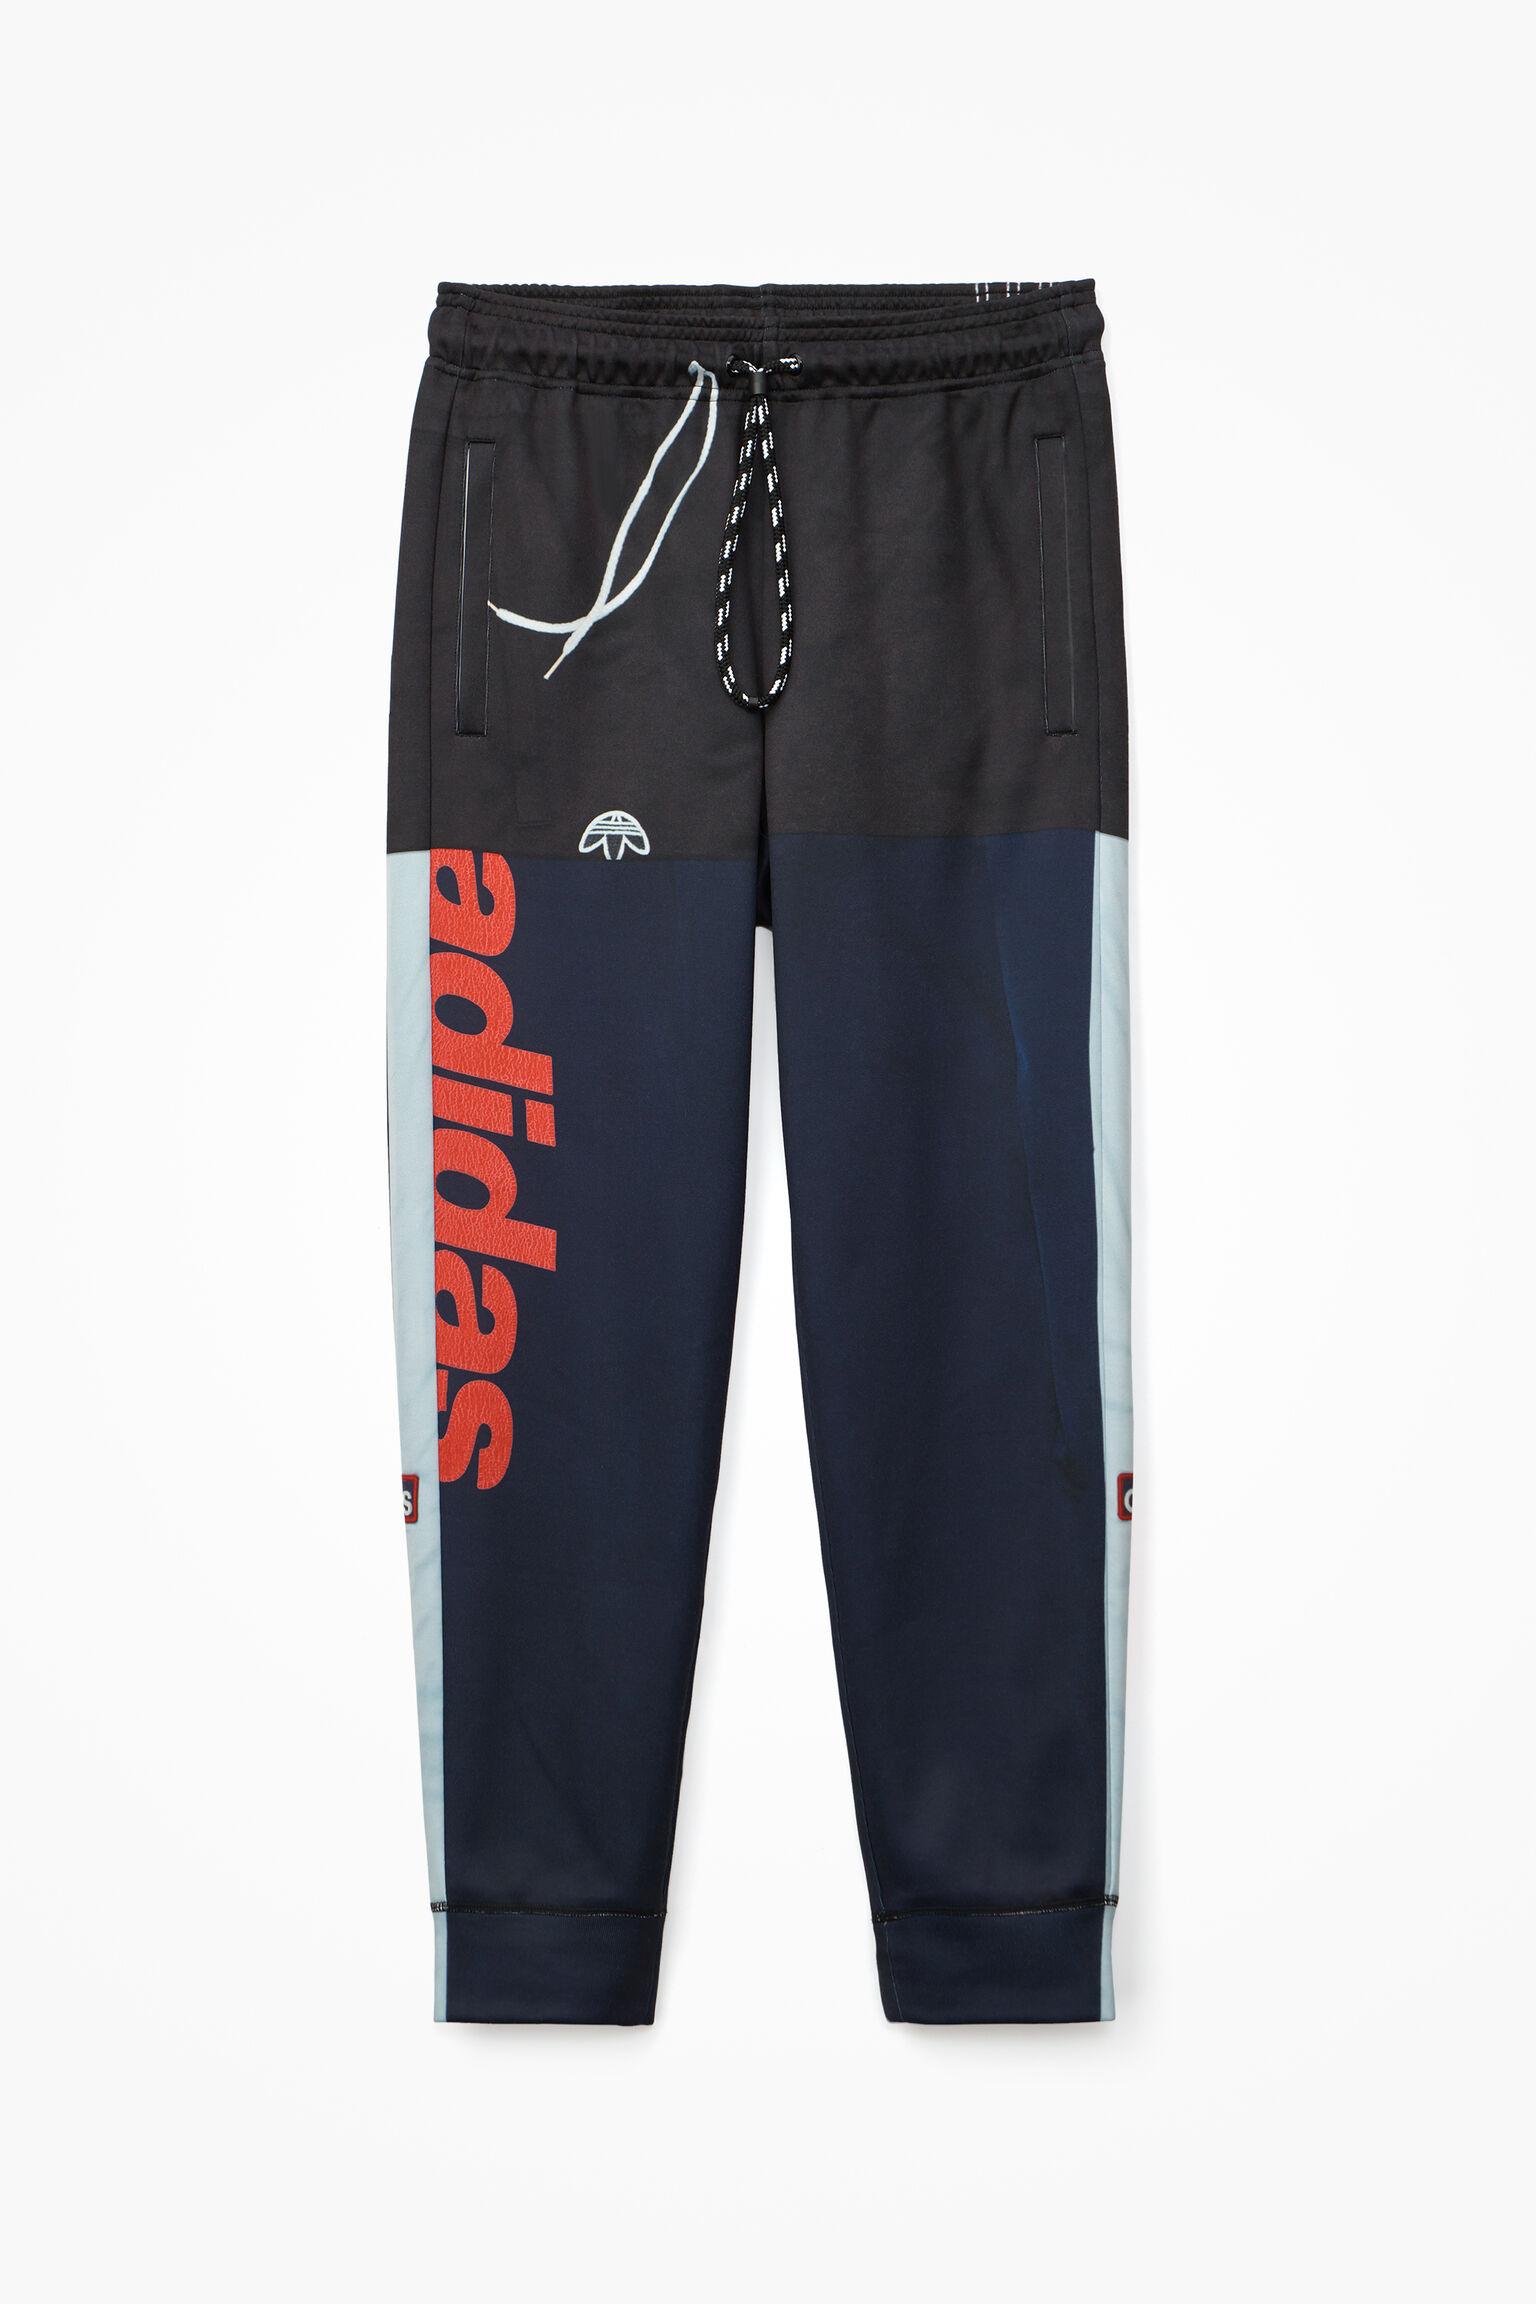 7ba481ede6 alexanderwang adidas originals by aw photocopy track pants - Alexander Wang